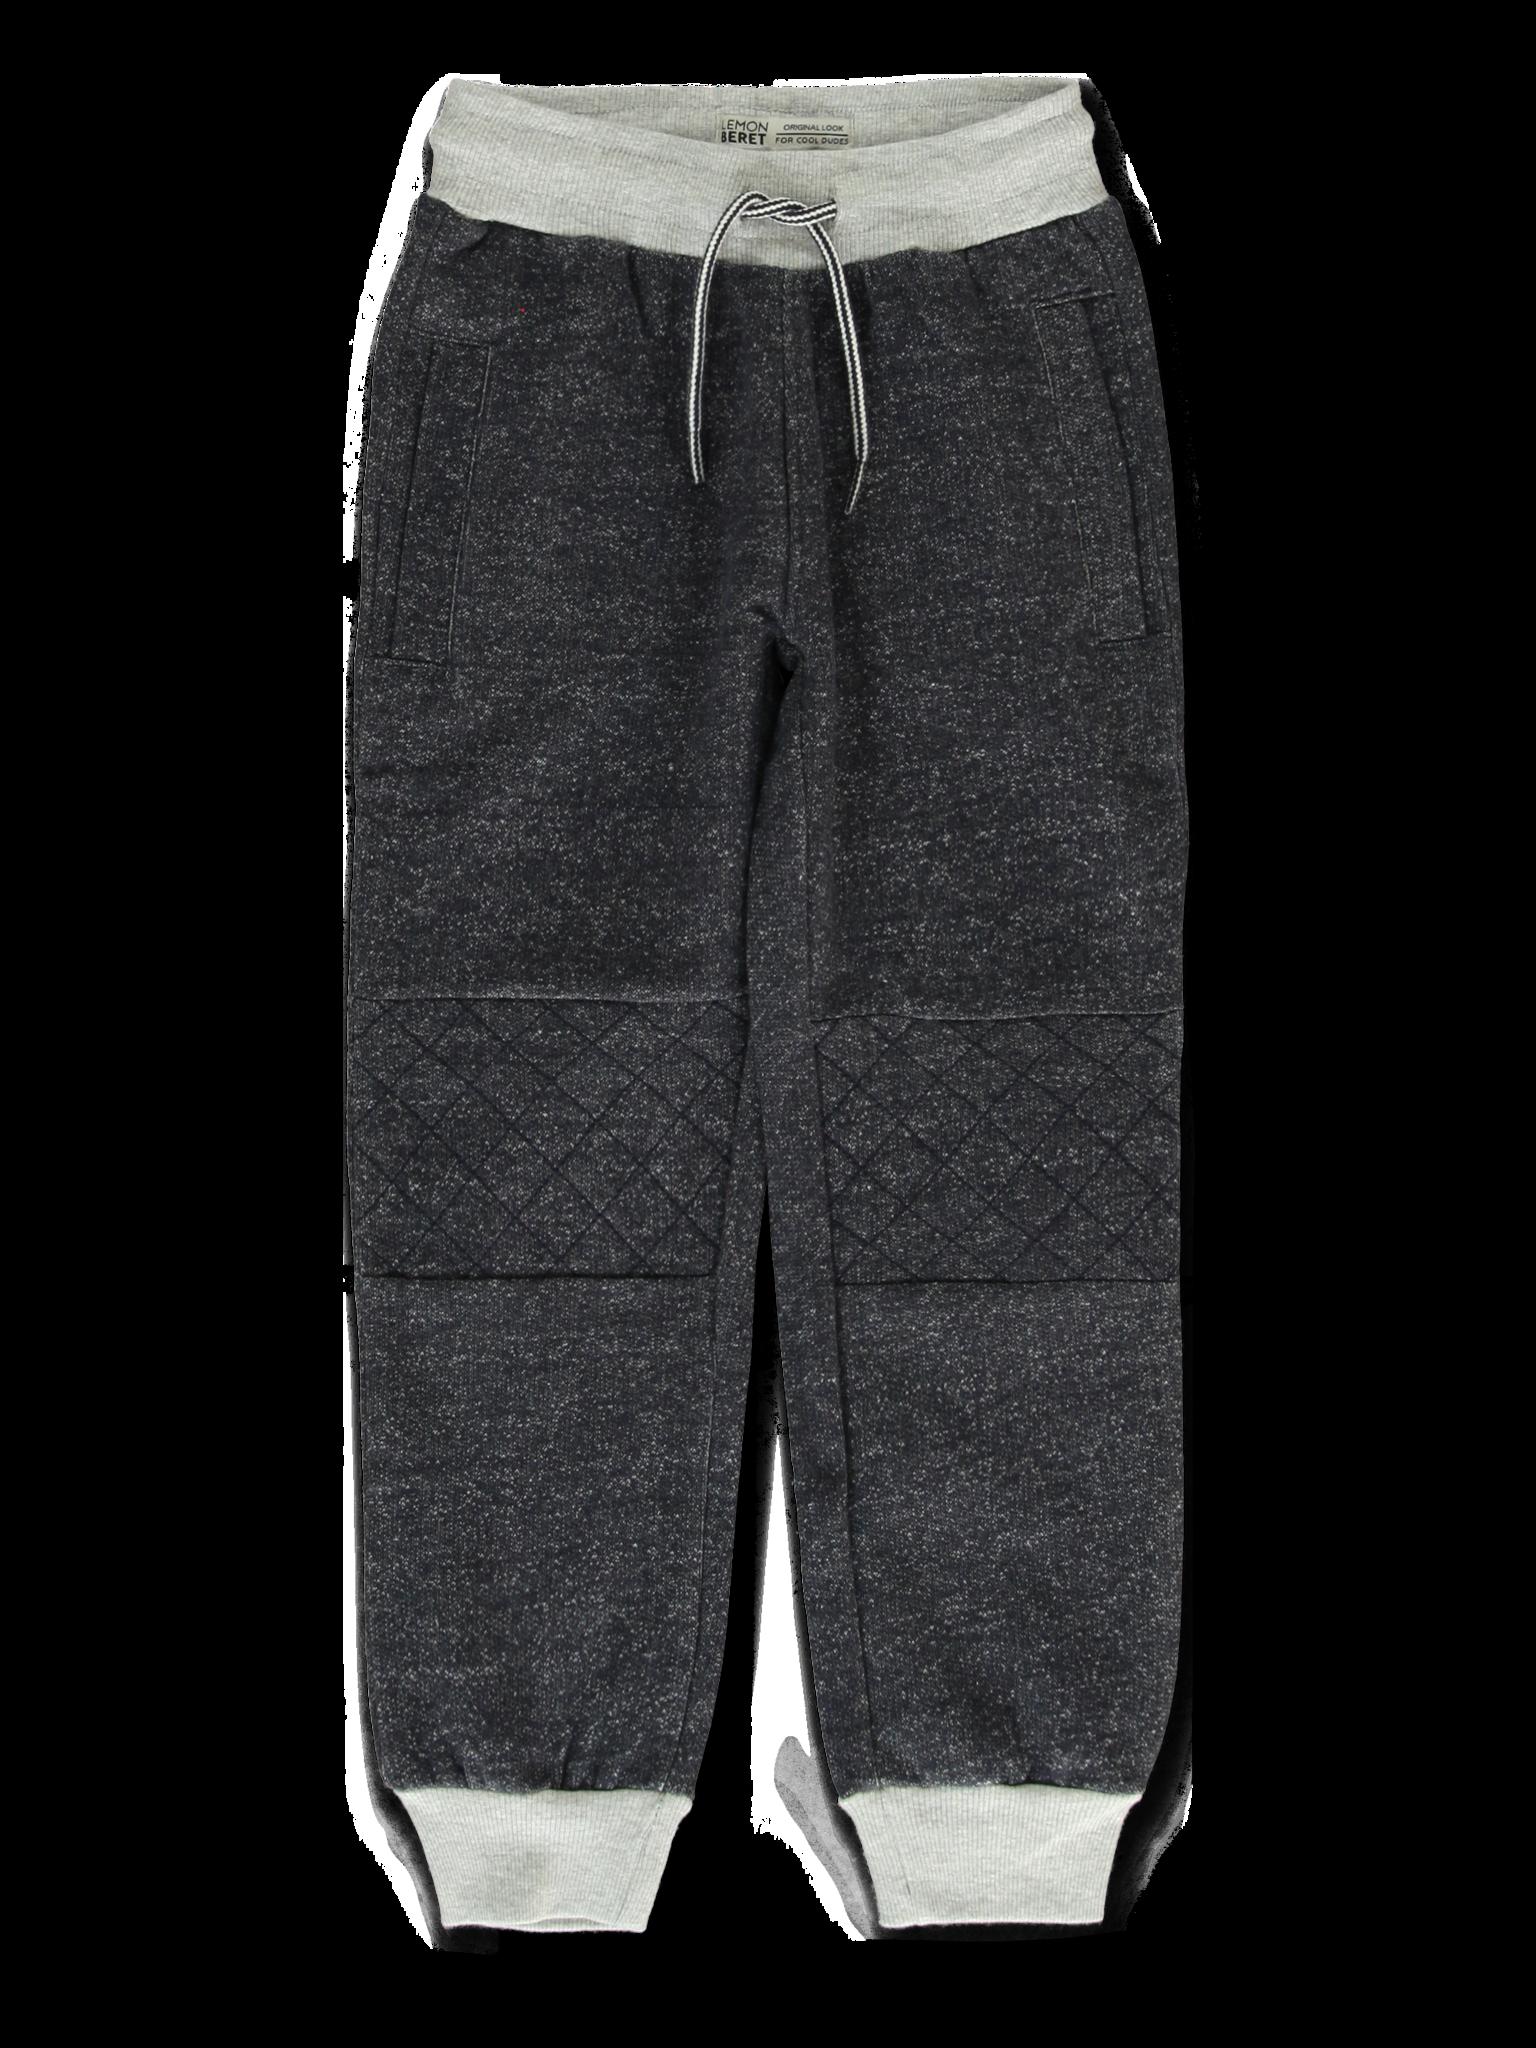 Lemon Beret | Winter 2019 Small Boys | Jogging Pant | 12 pcs/box